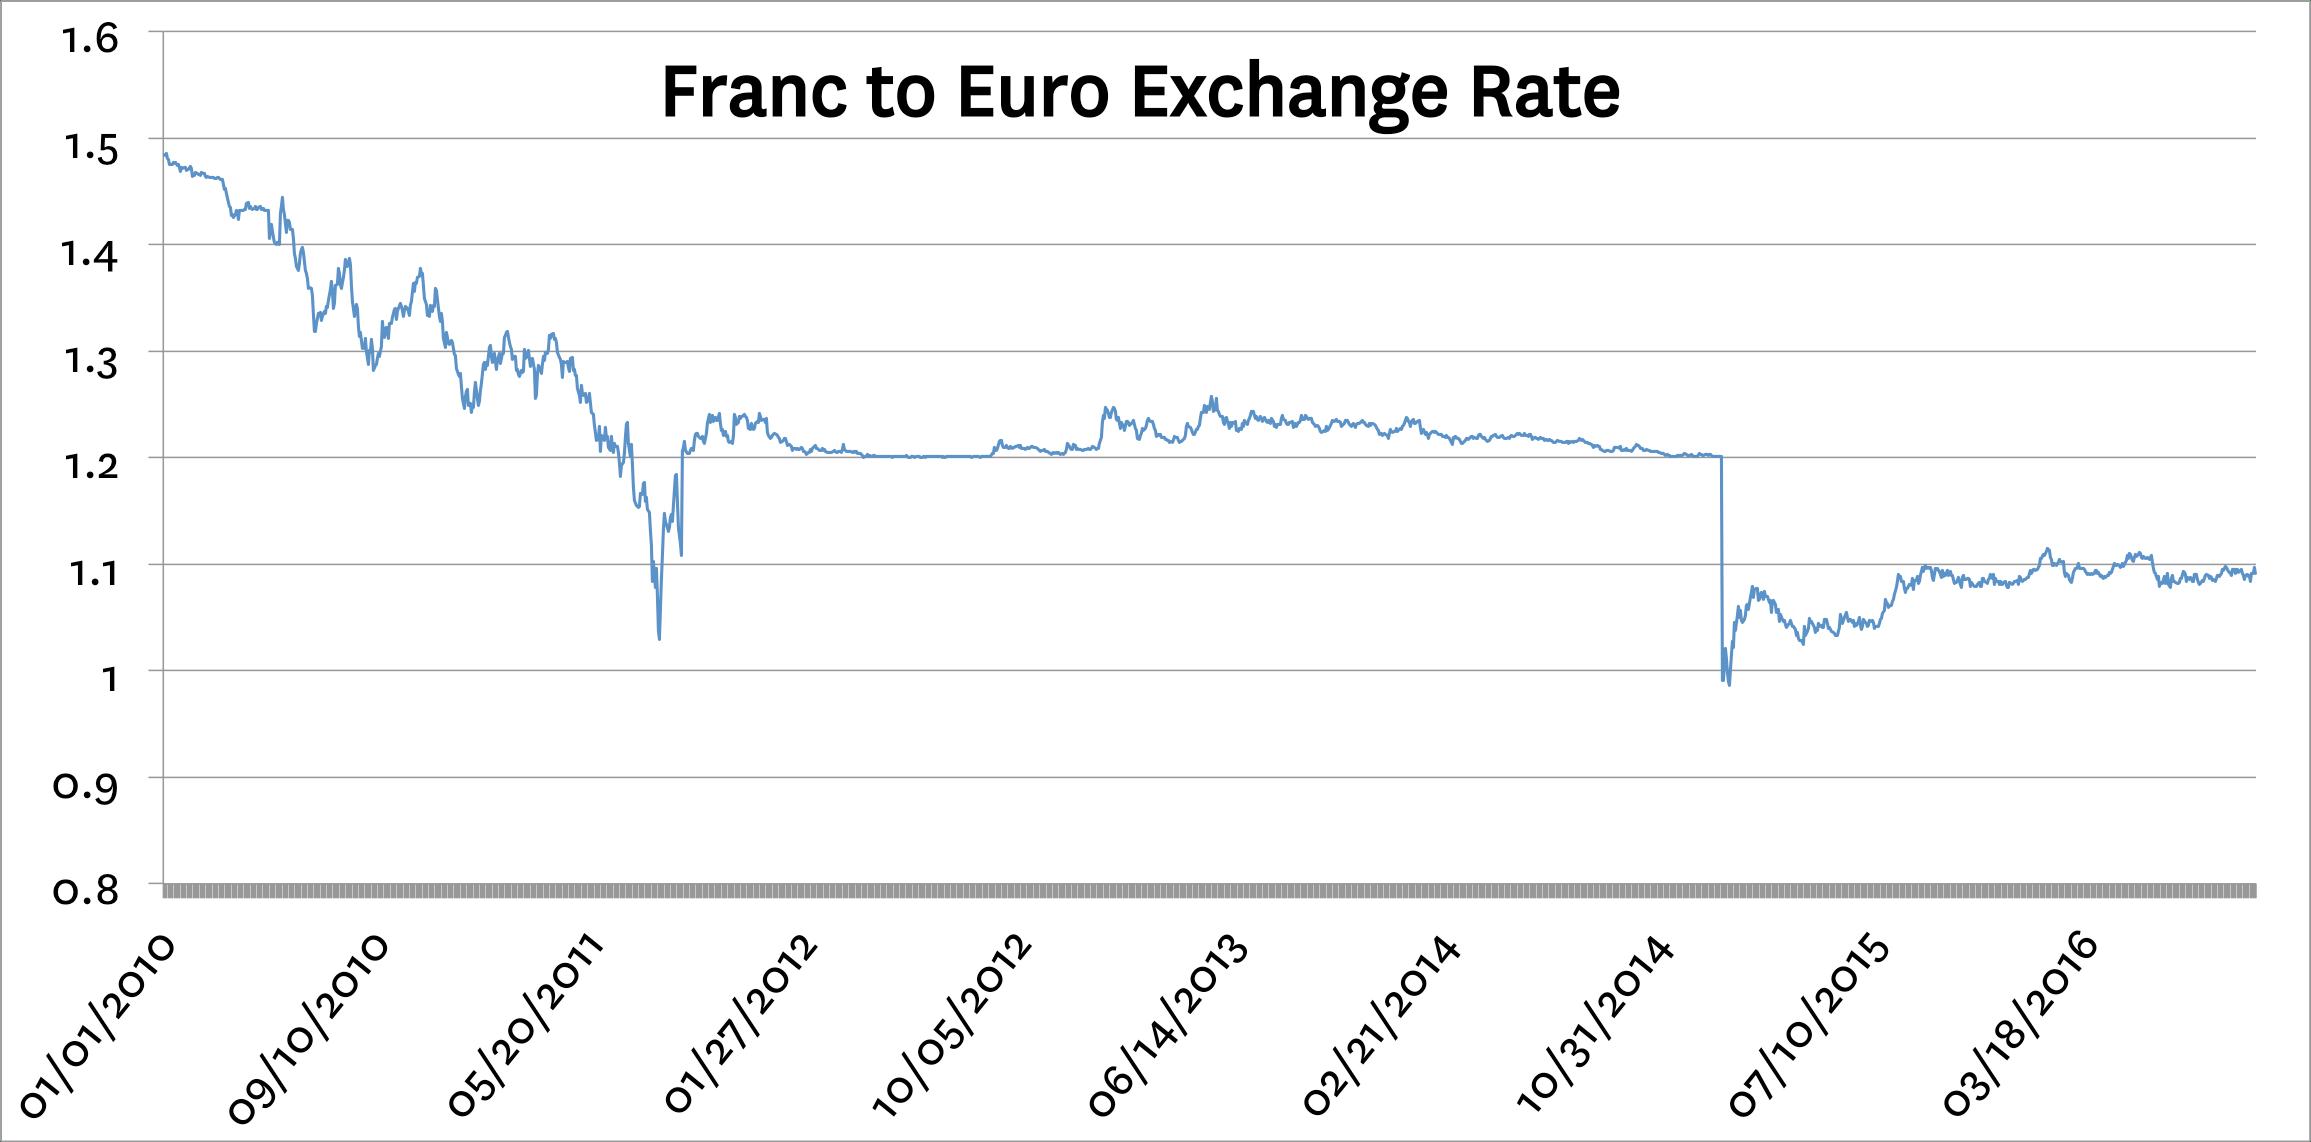 FrancToEuroFinalEdit.png